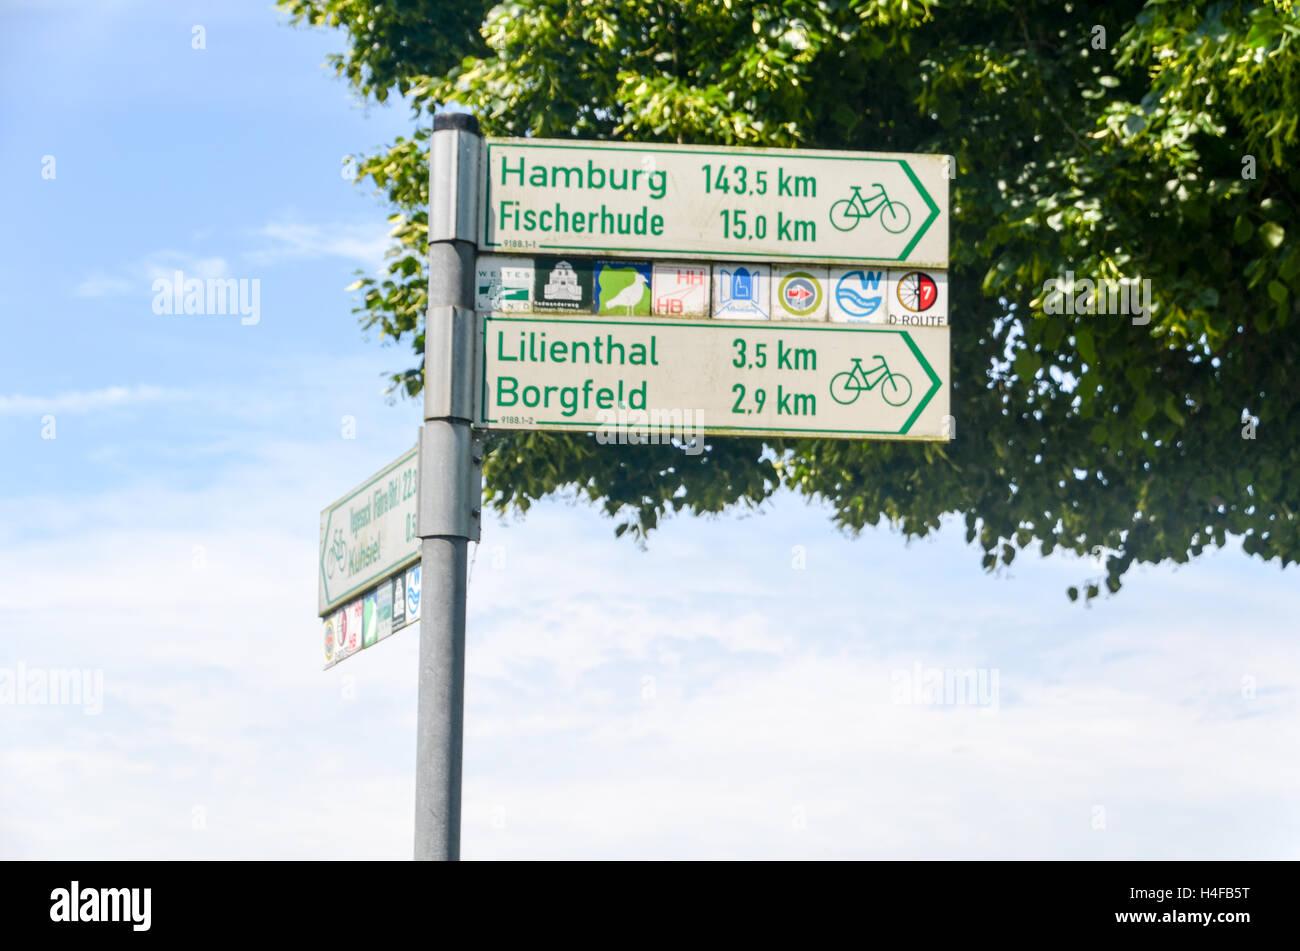 Cycling path between Bremen and Hamburg, Germany Stock Photo